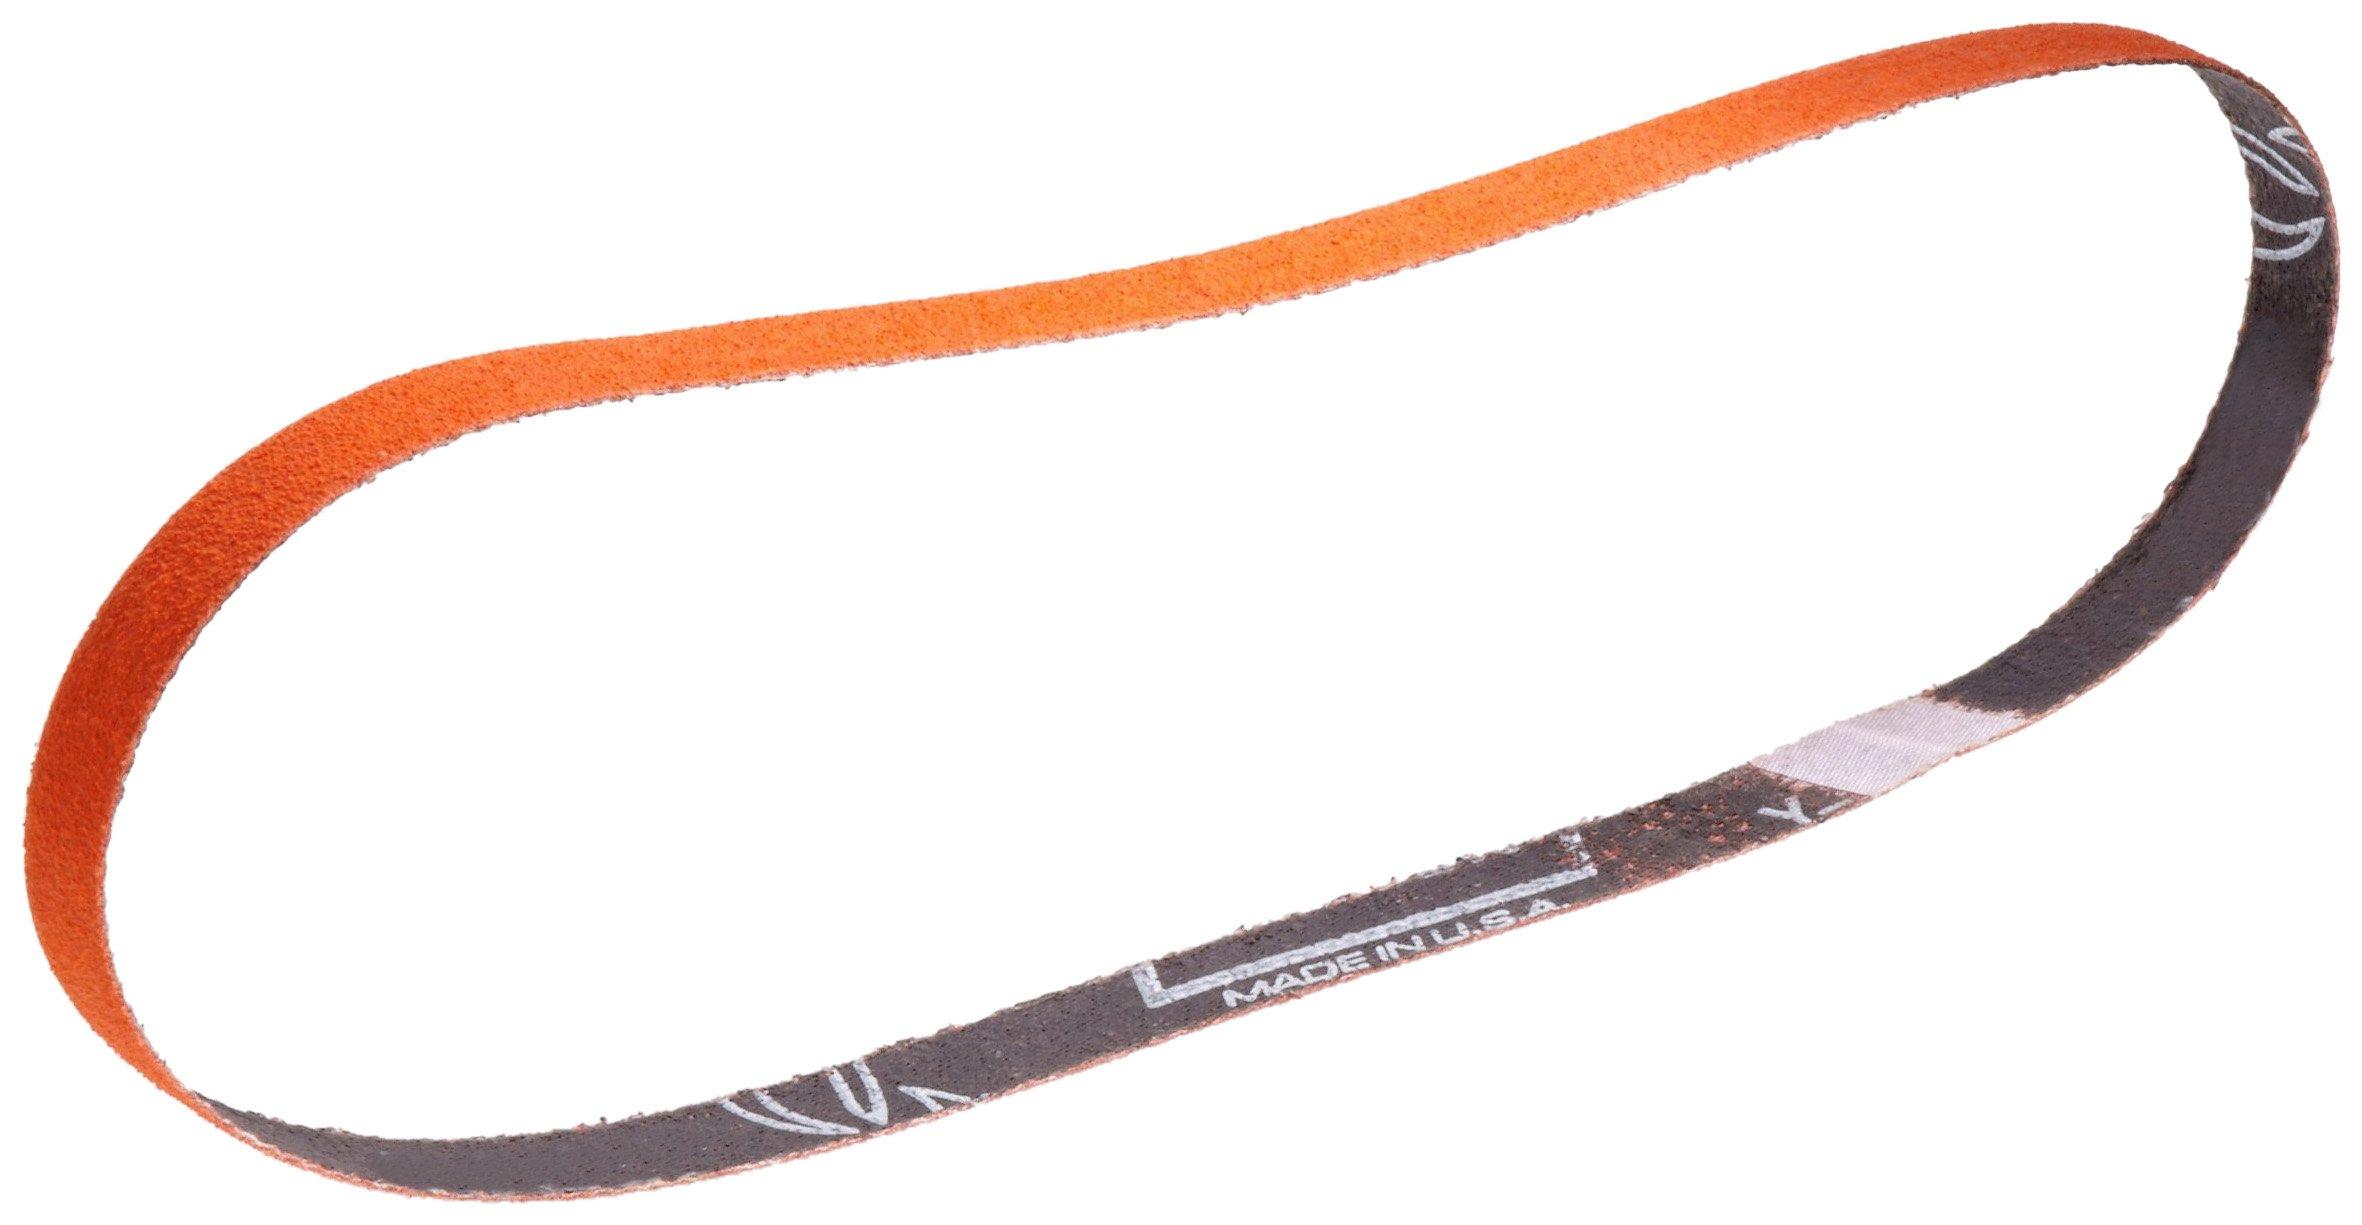 Norton SG Blaze R980P File Abrasive Belt, Waterproof, Cloth Backing, Ceramic Aluminum Oxide, 1/2'' Width, 12'' Length, Grit 40 (Pack of 50)